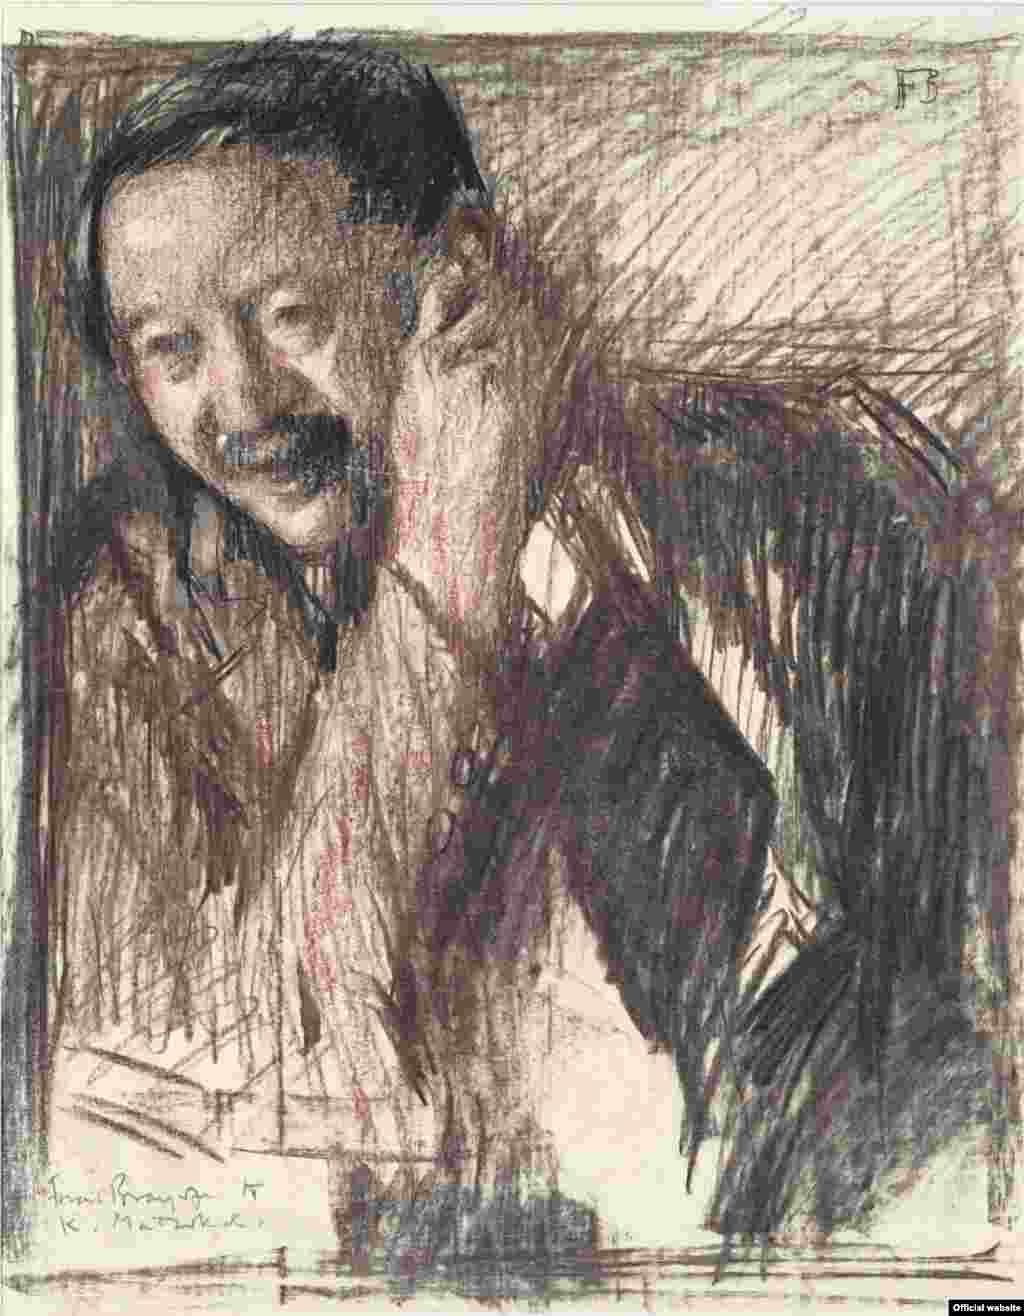 Frank Brangwyn, Portretul lui Kojiro Matsukata. The National Museum of Western Art, Tokyo.